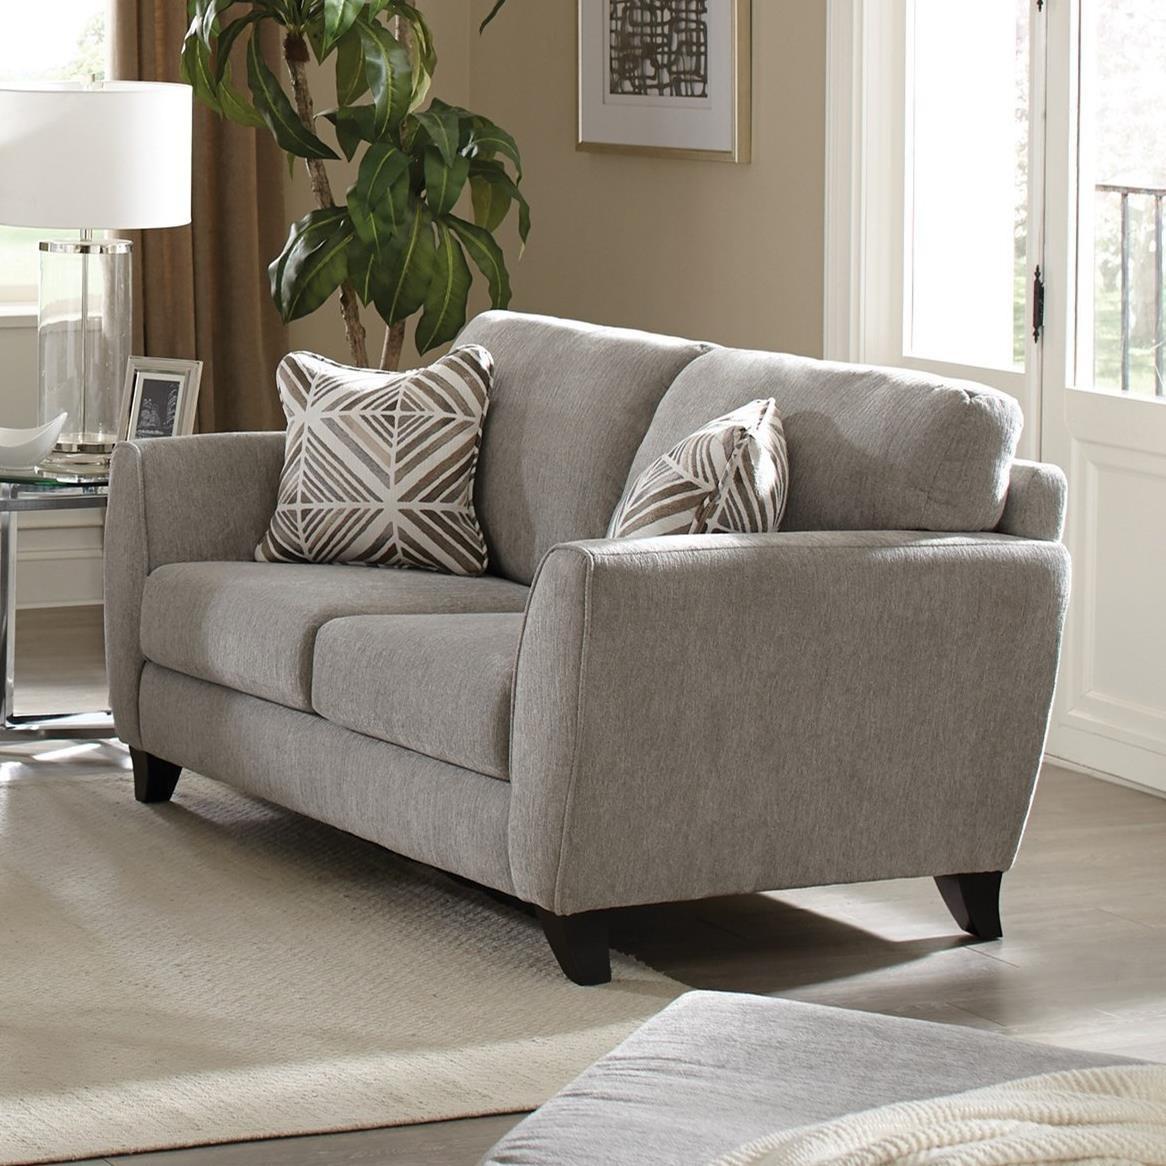 Jackson Furniture Alyssa Contemporary Loveseat With Exposed Wood Feet Wayside Furniture Loveseats